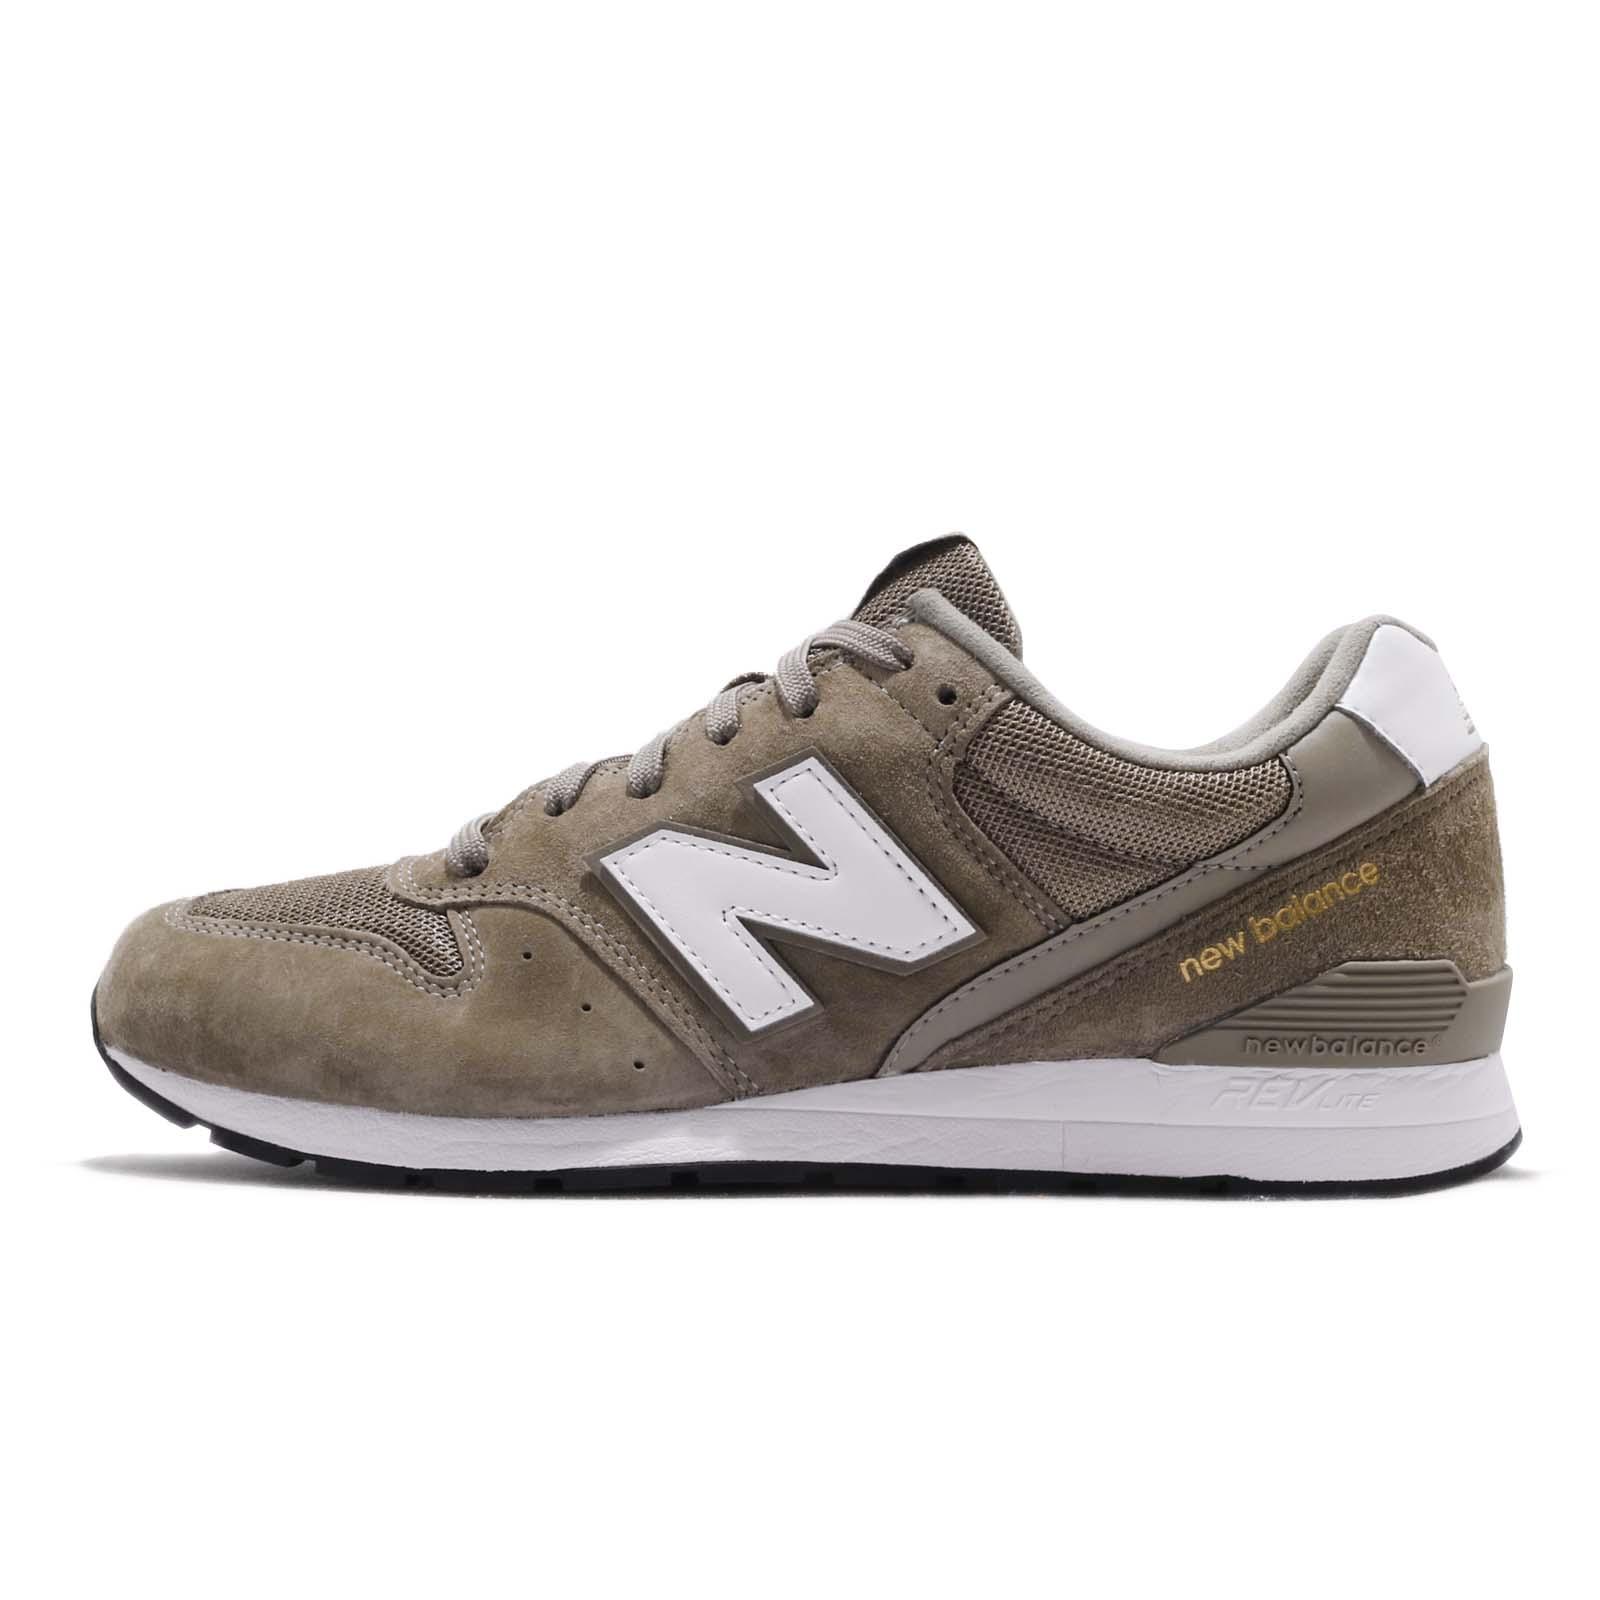 nuevo autentico oficial Garantía de calidad 100% New Balance MRL996PT D Green White Gold Men Running Shoes Sneakers ...